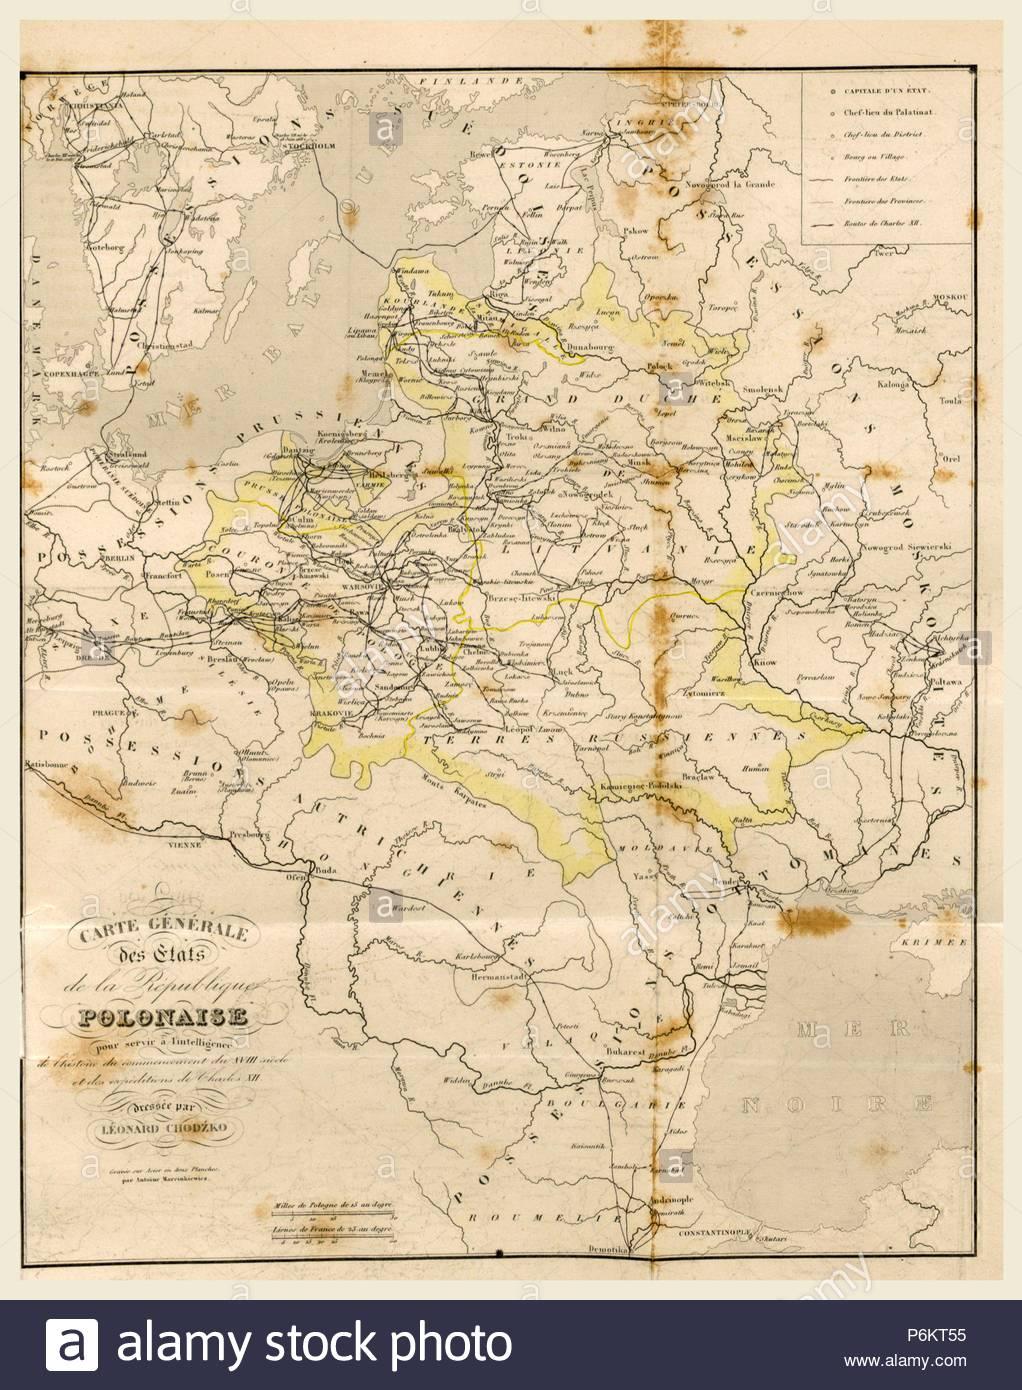 Map Poland, 19th century engraving. - Stock Image